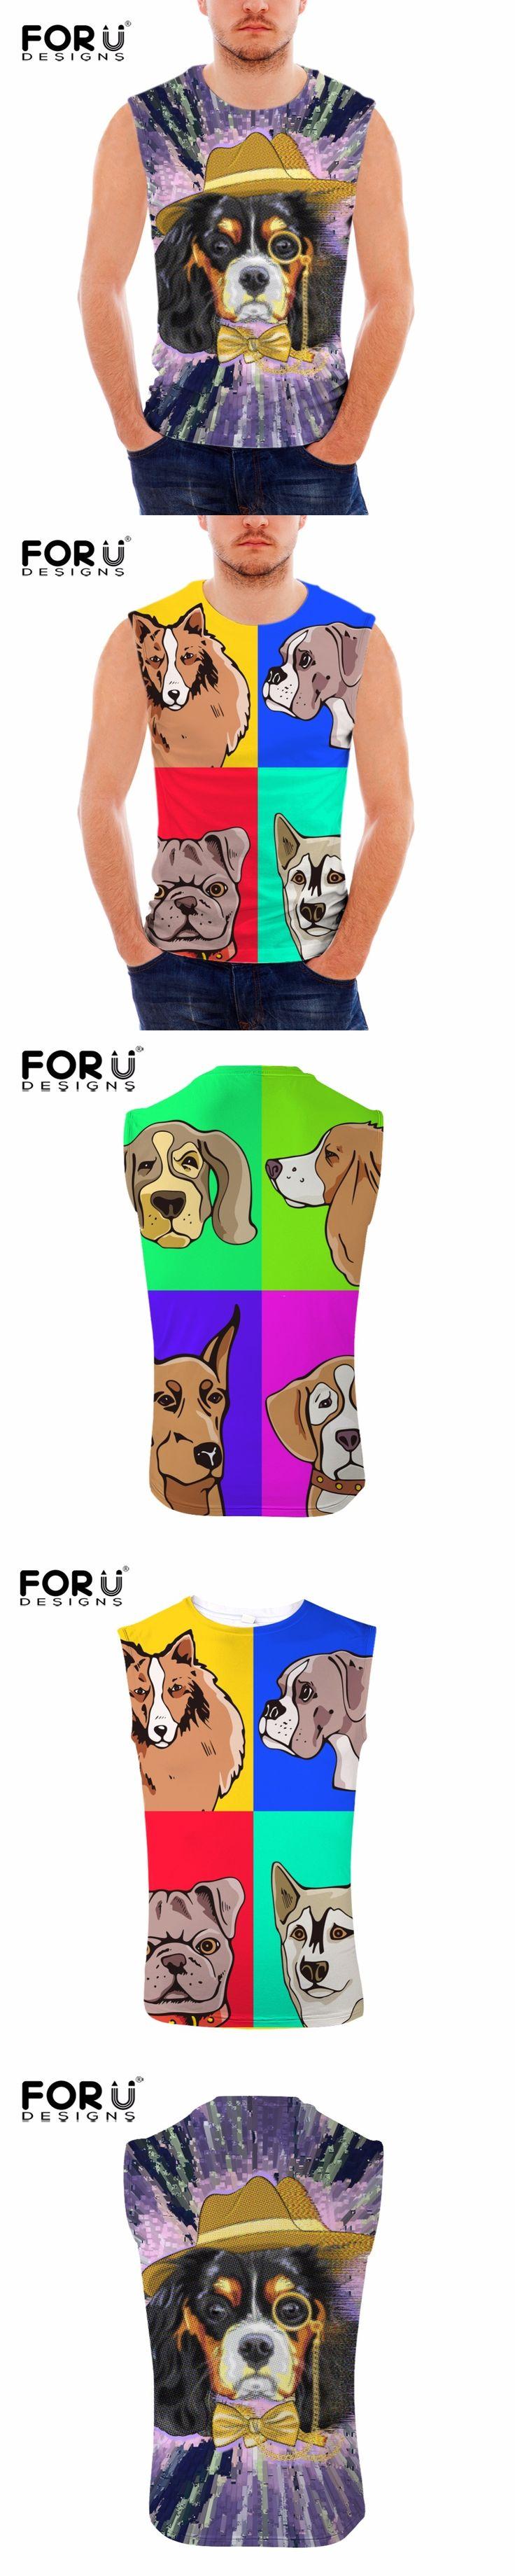 FORUDESIGNS 3D Cartoon Animal Dog Print Tank Top for Man Designer Male Bodybuilding Fitness Top Tees Sleeveless Blusa Masculina